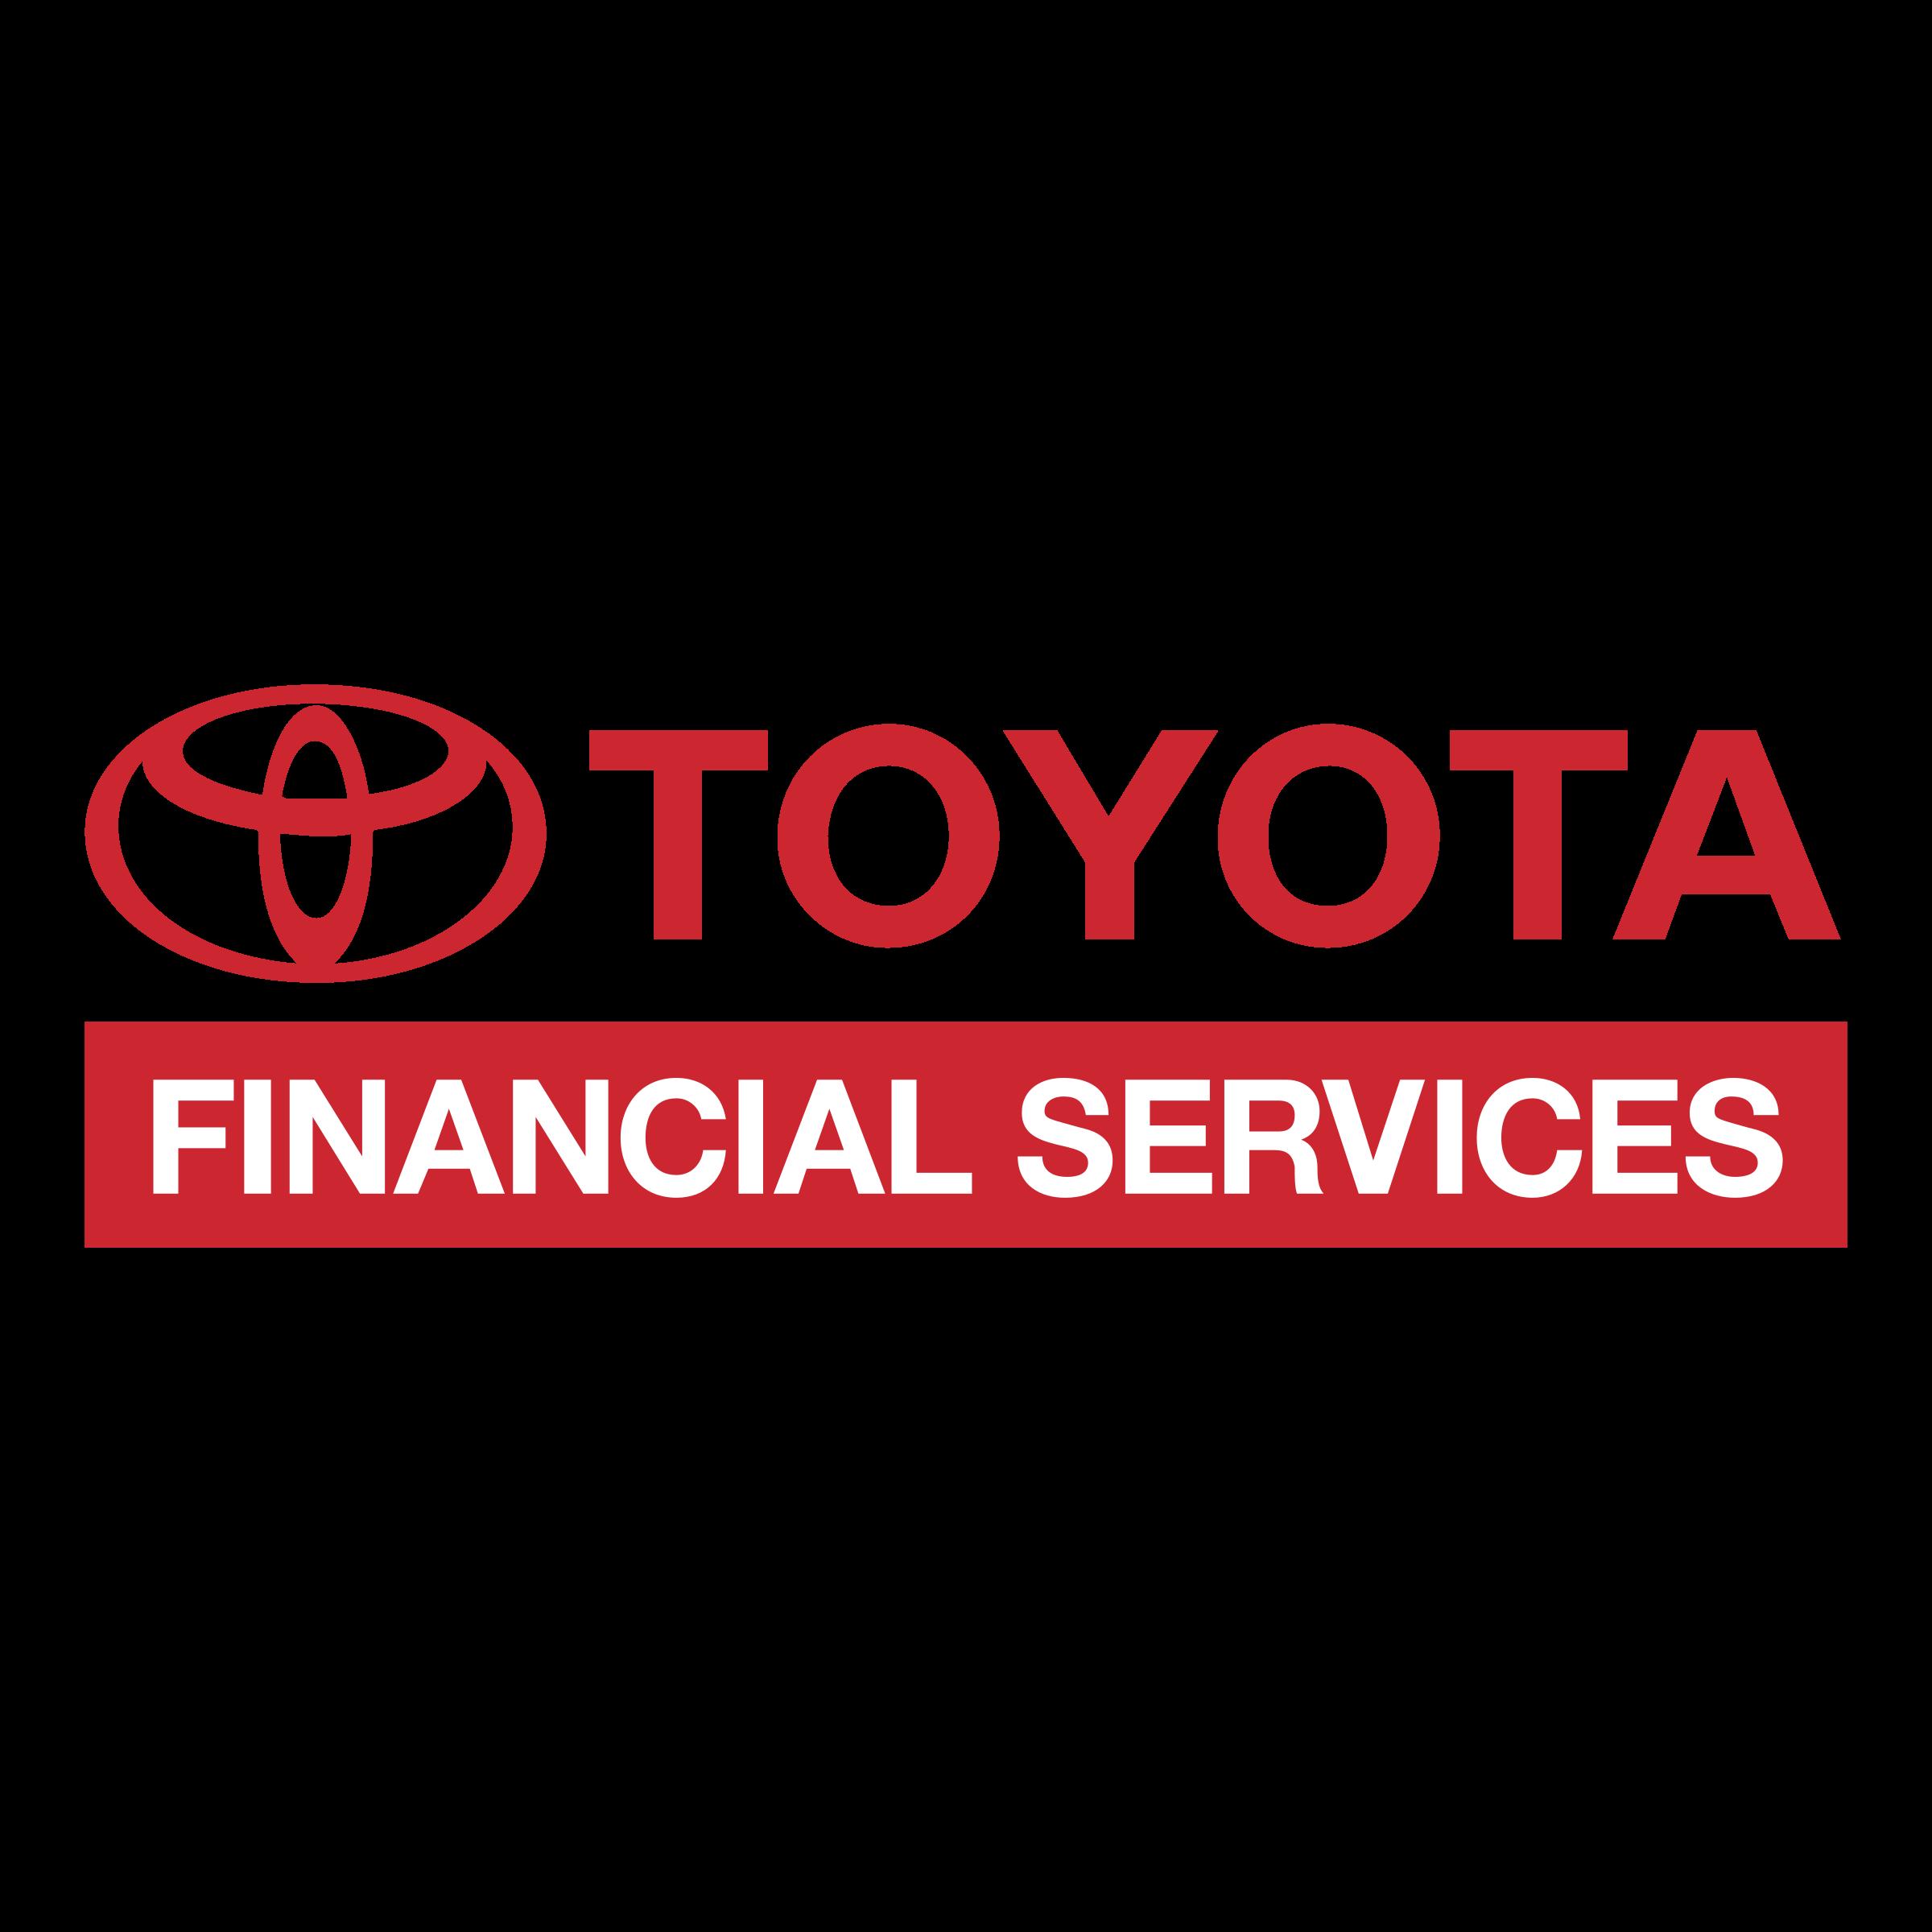 toyota financial services logo png transparent amp svg